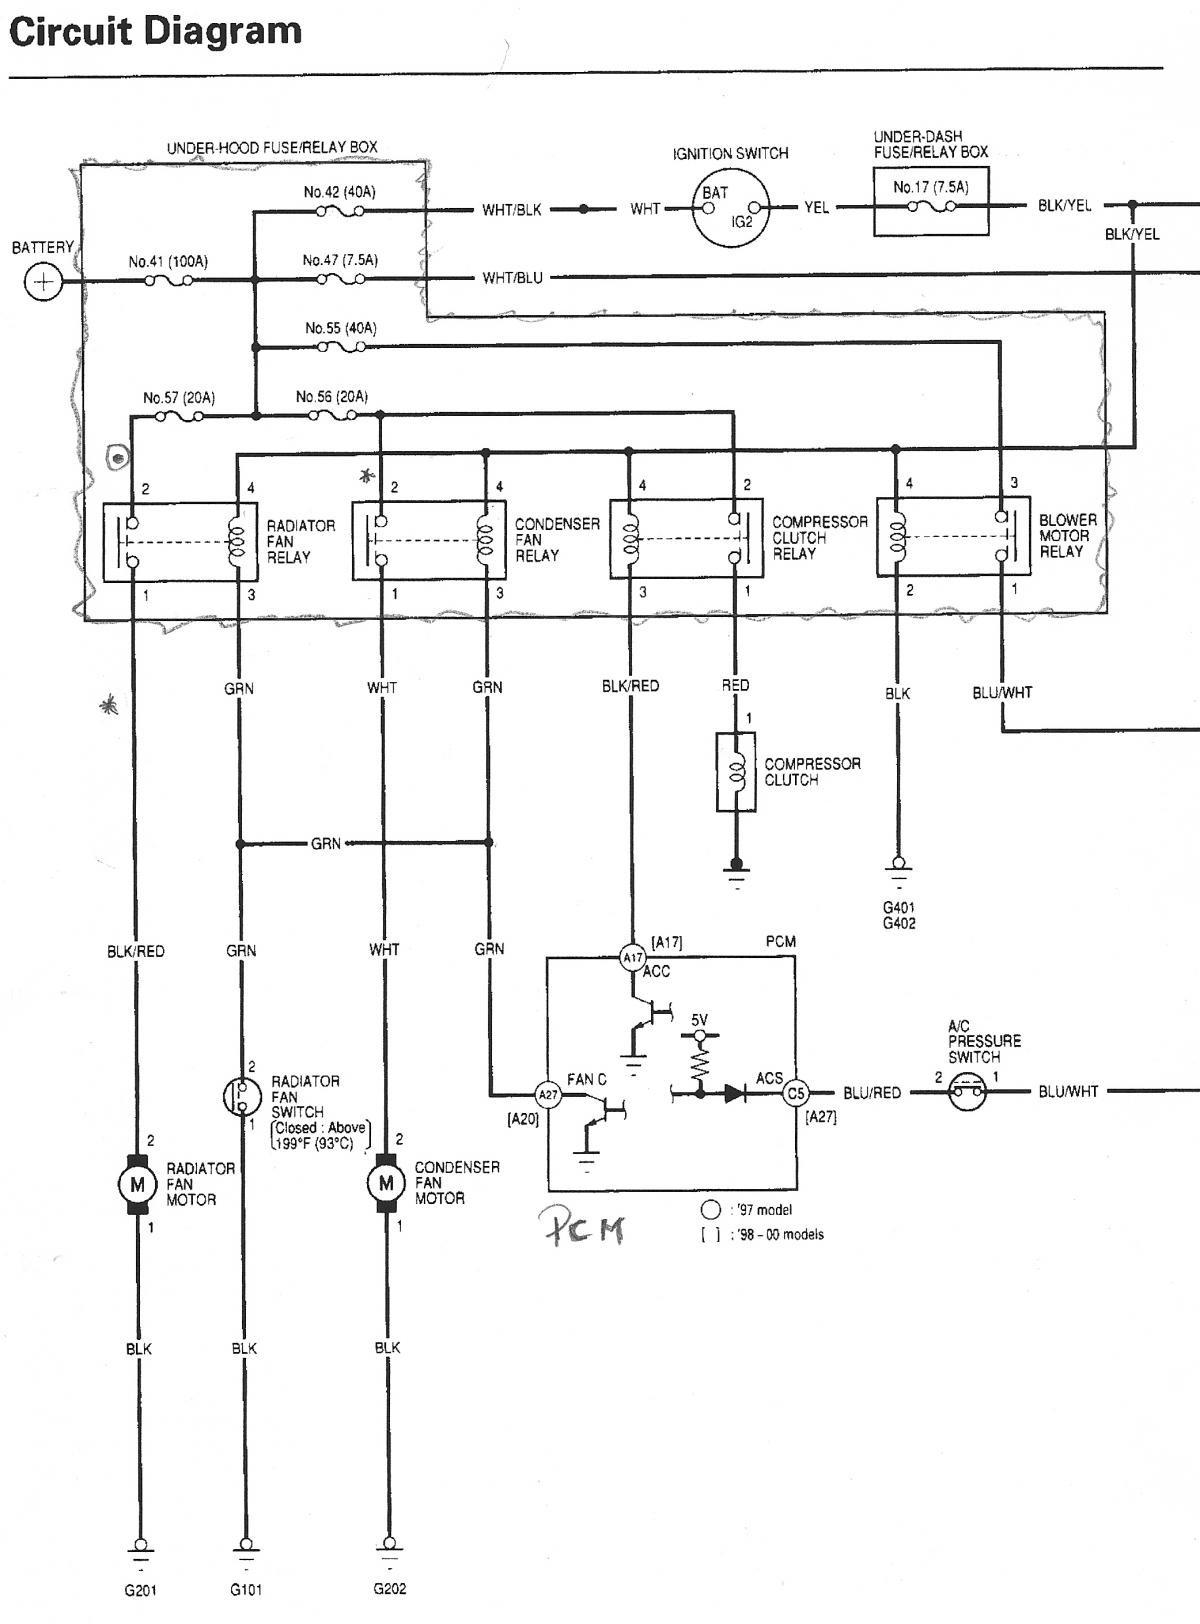 Tundra Wiring Diagram Moreover 2000 Toyota Tundra Wiring Diagram